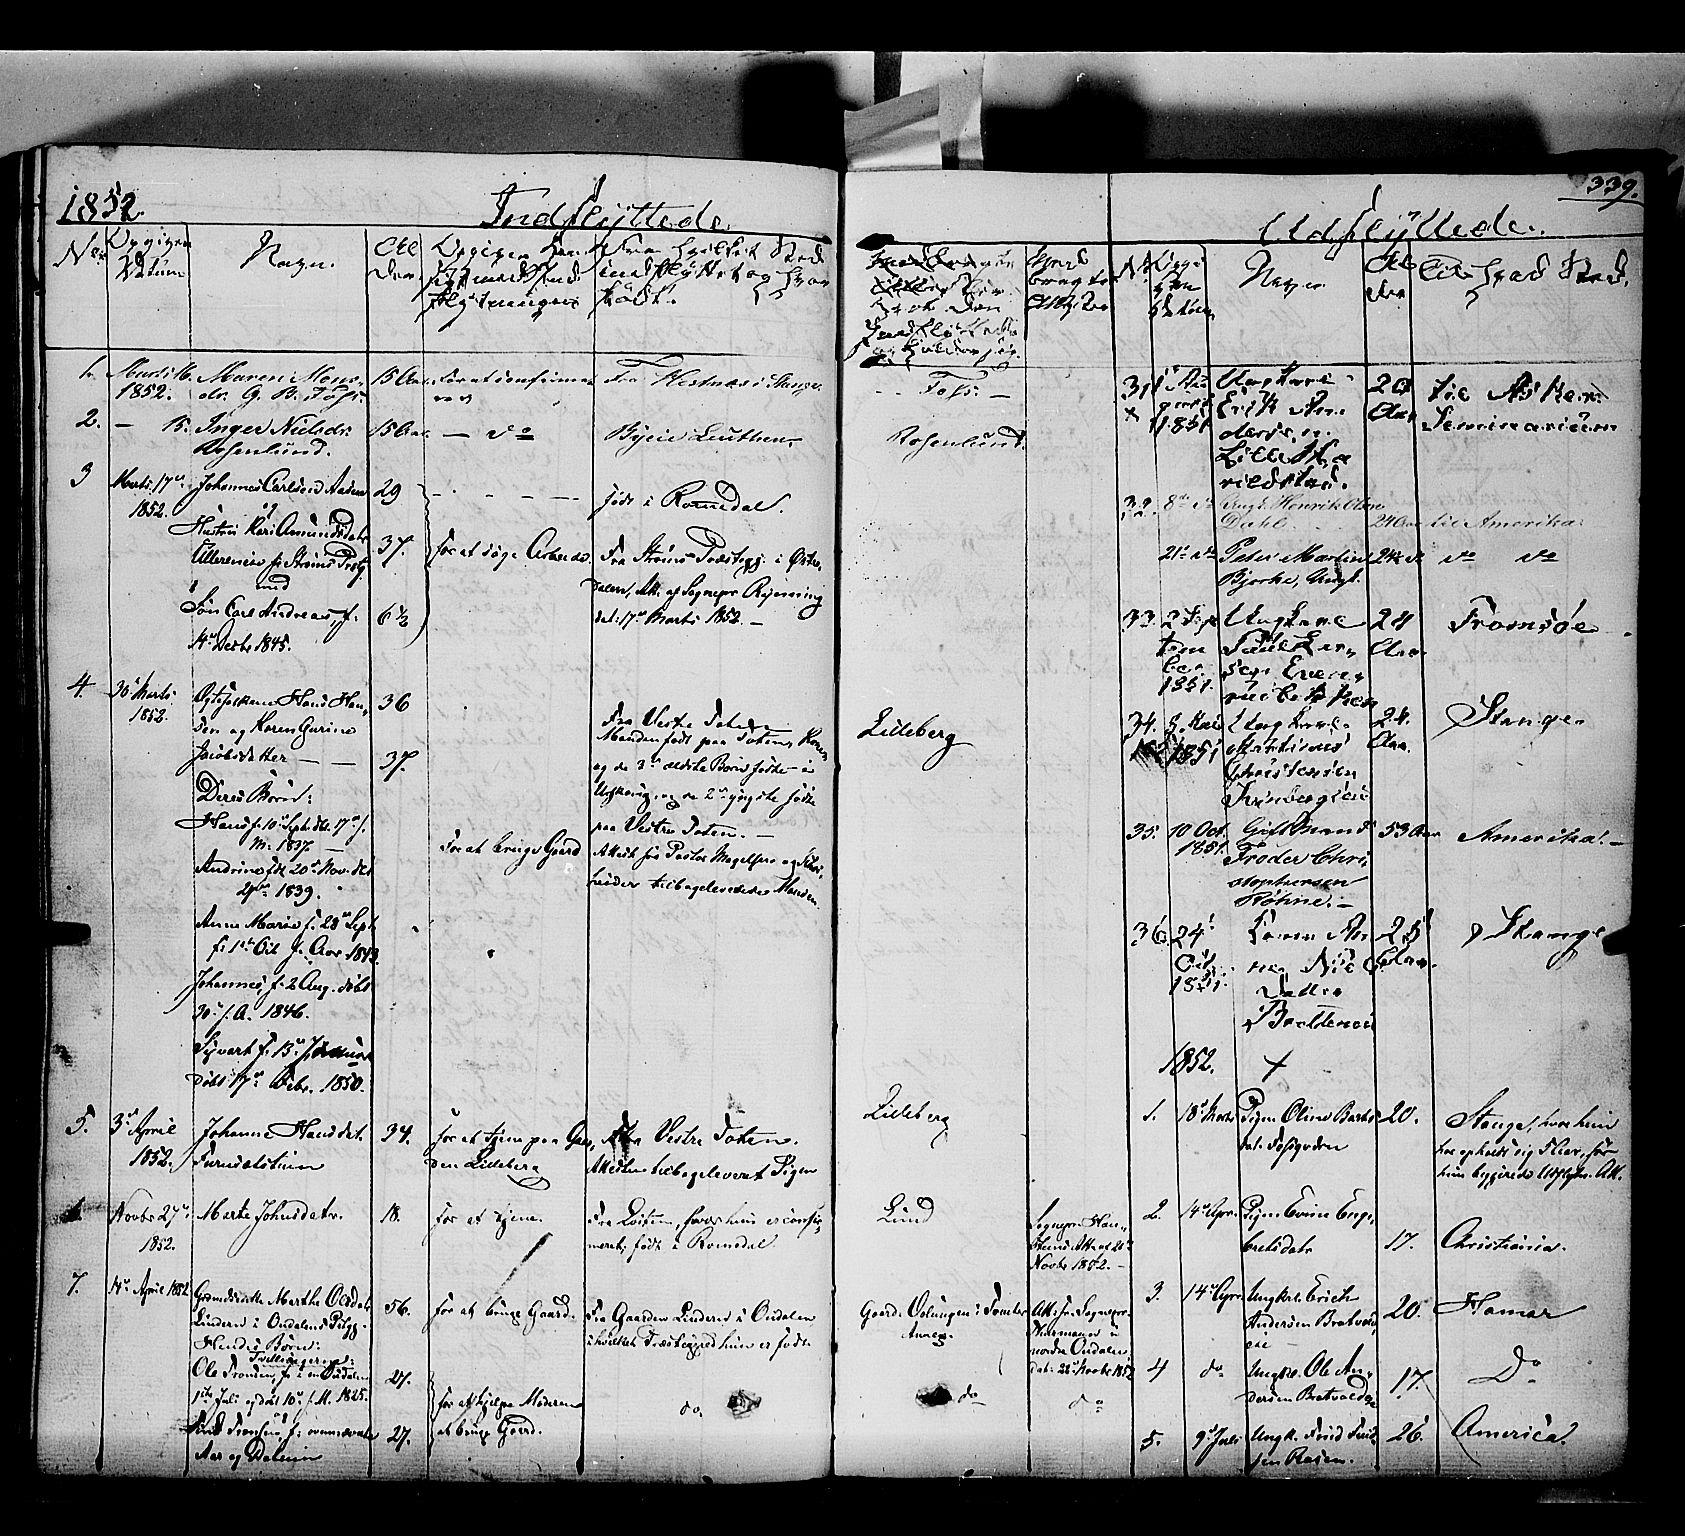 SAH, Romedal prestekontor, K/L0004: Ministerialbok nr. 4, 1847-1861, s. 339